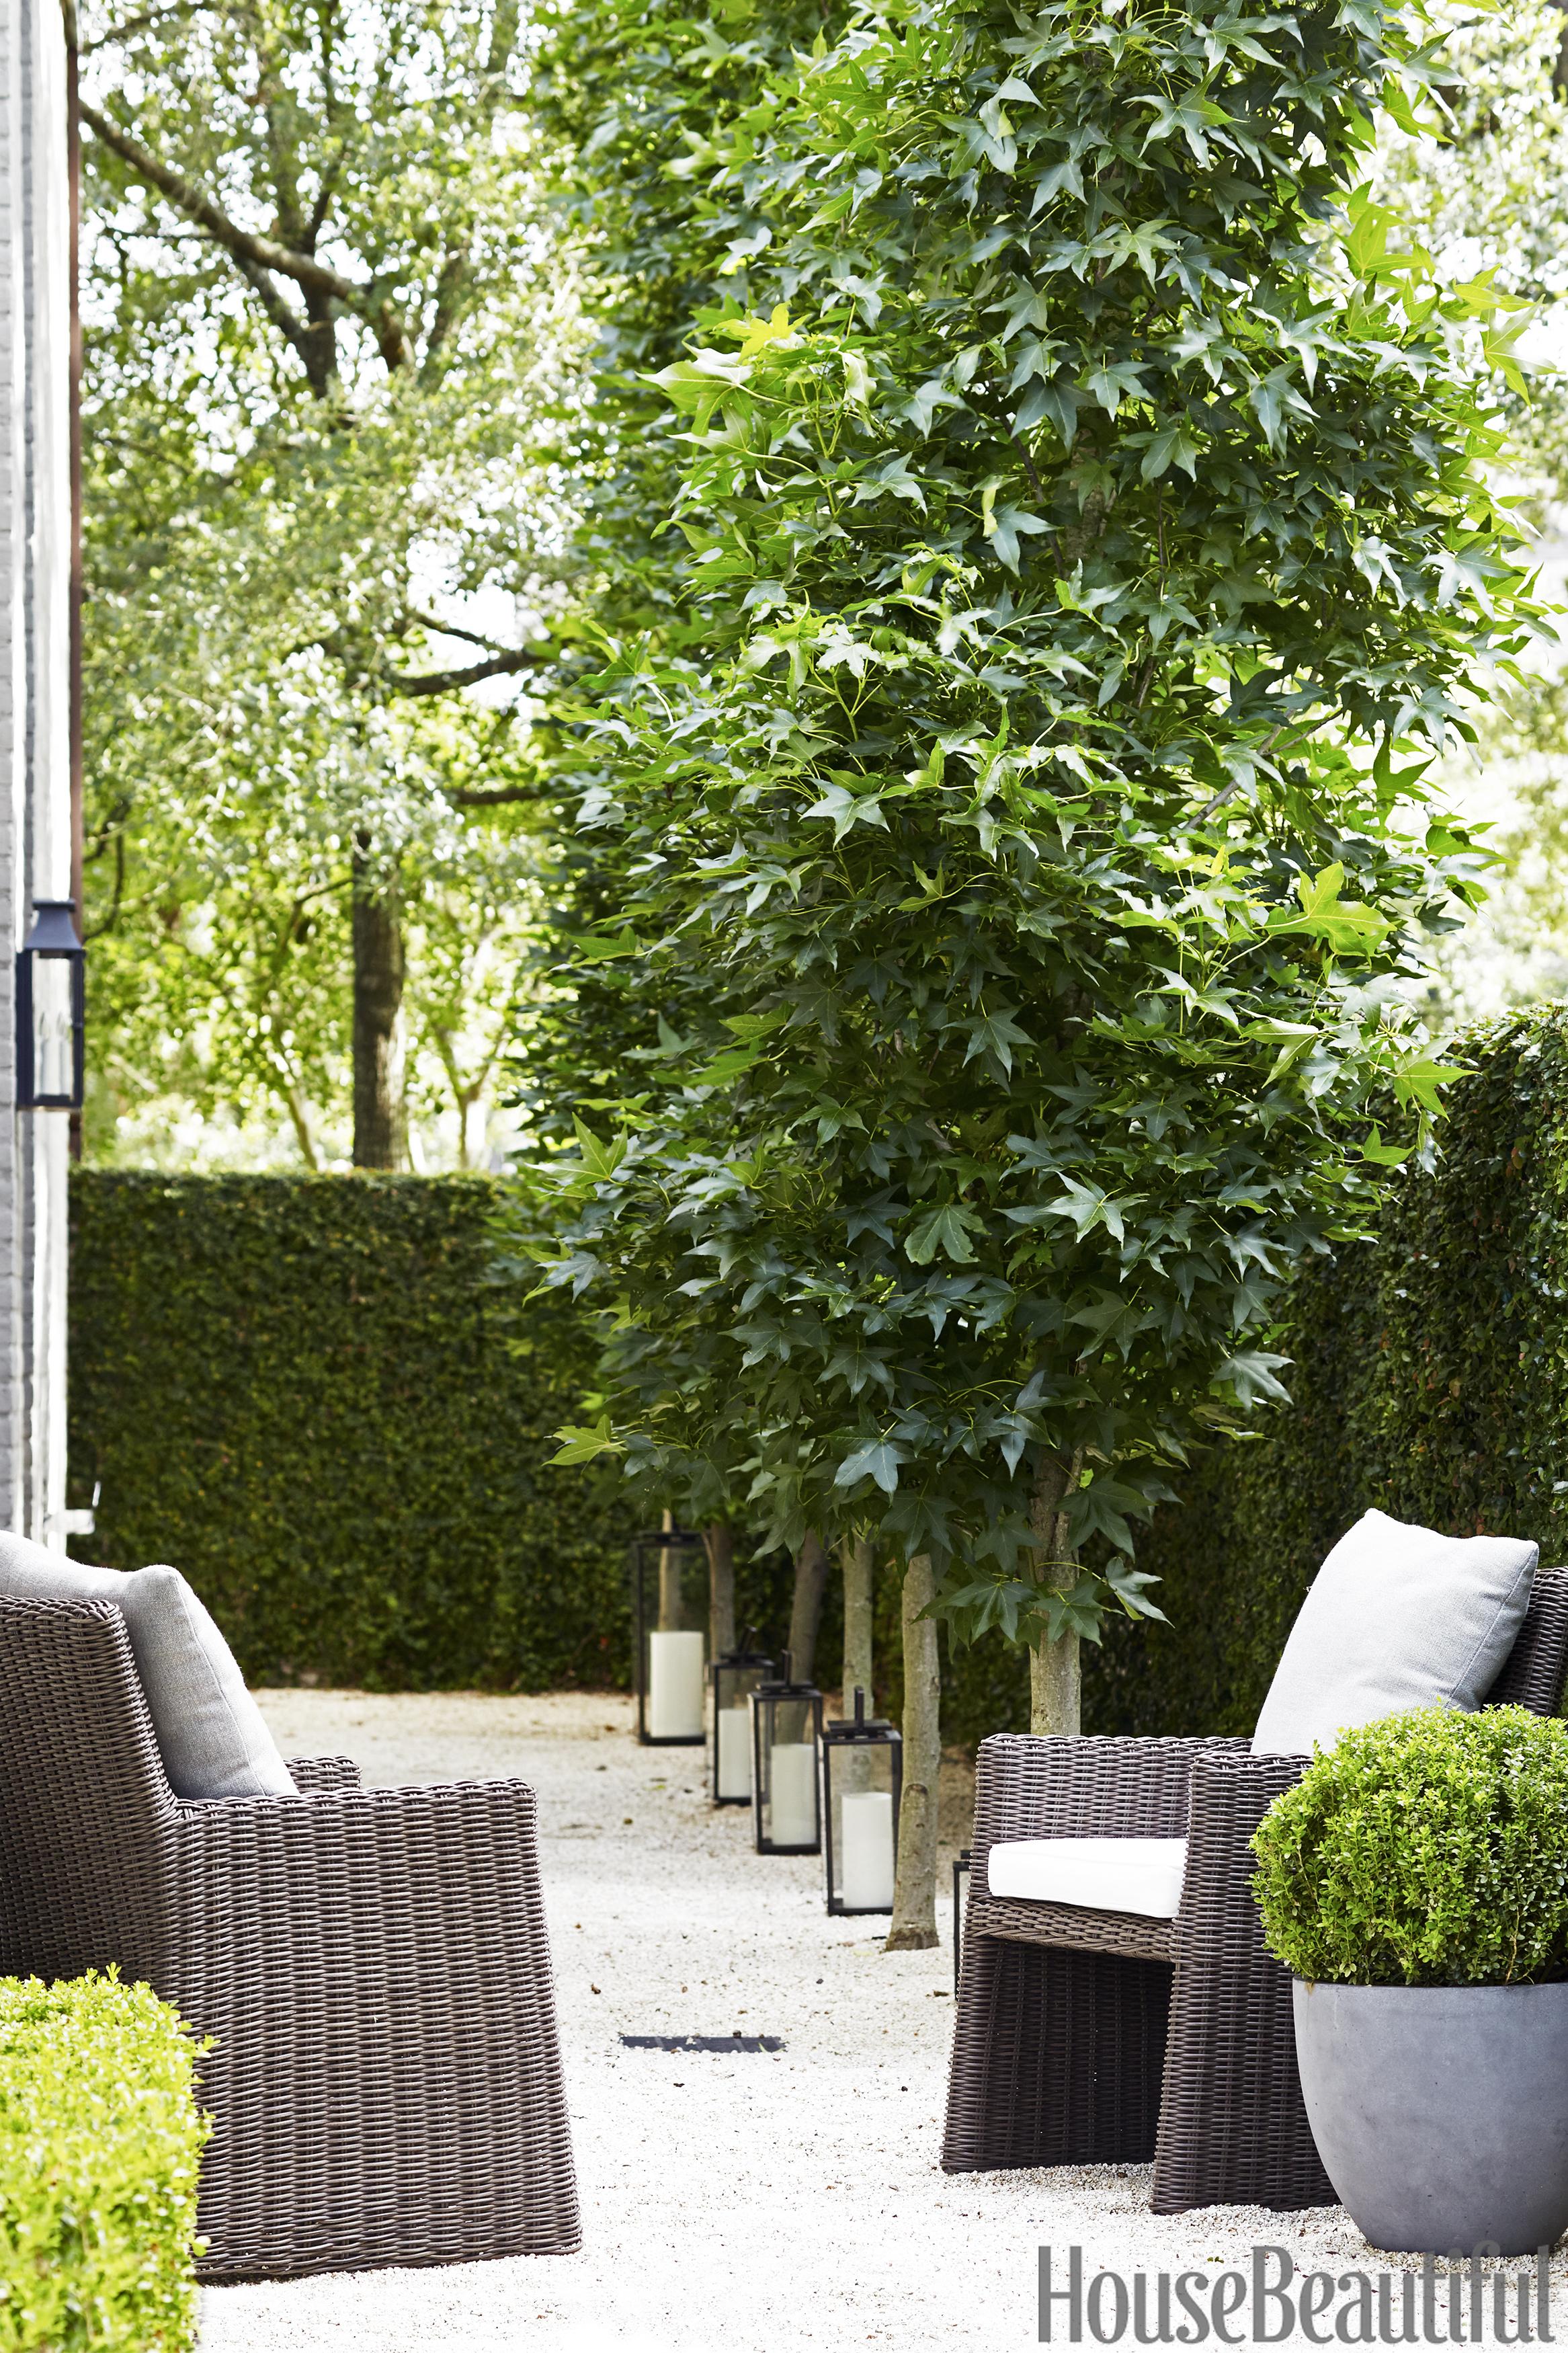 50 Beautiful Landscaping Ideas - Best Backyard Landscape ... on Best Backyard Landscaping Ideas id=54916